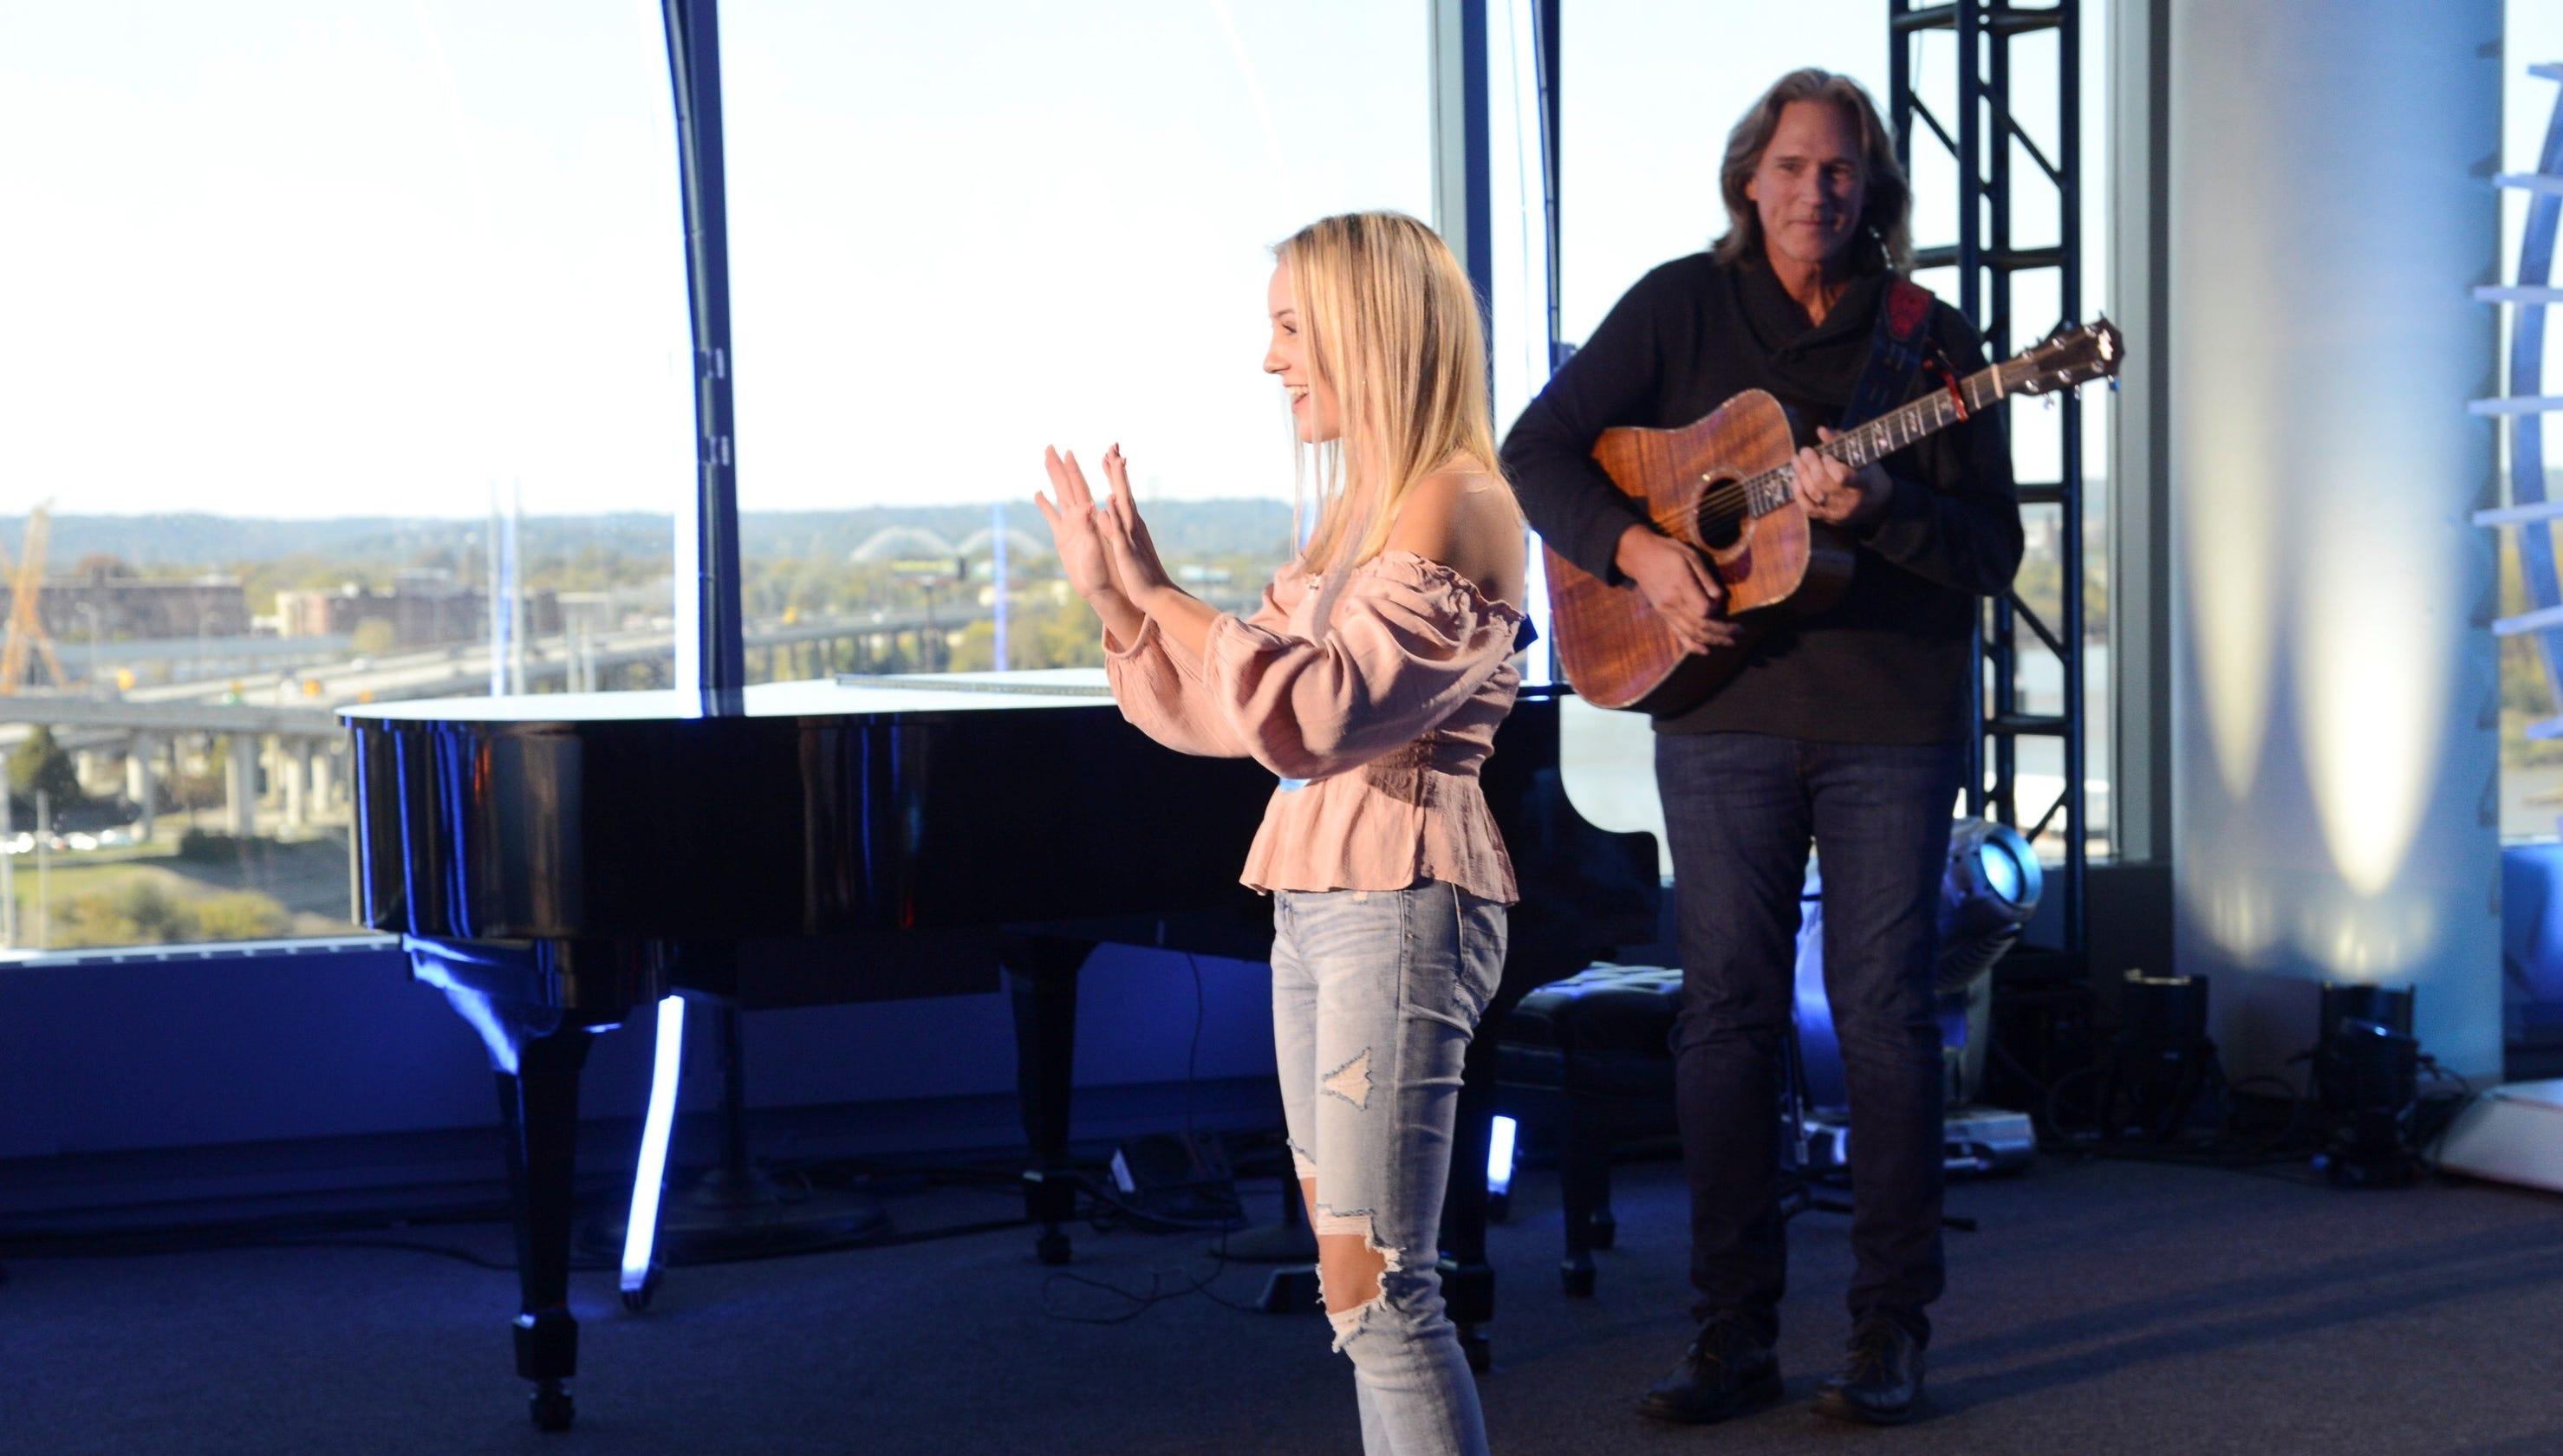 Meet the Santa Rosa County singers on this season's 'American Idol'